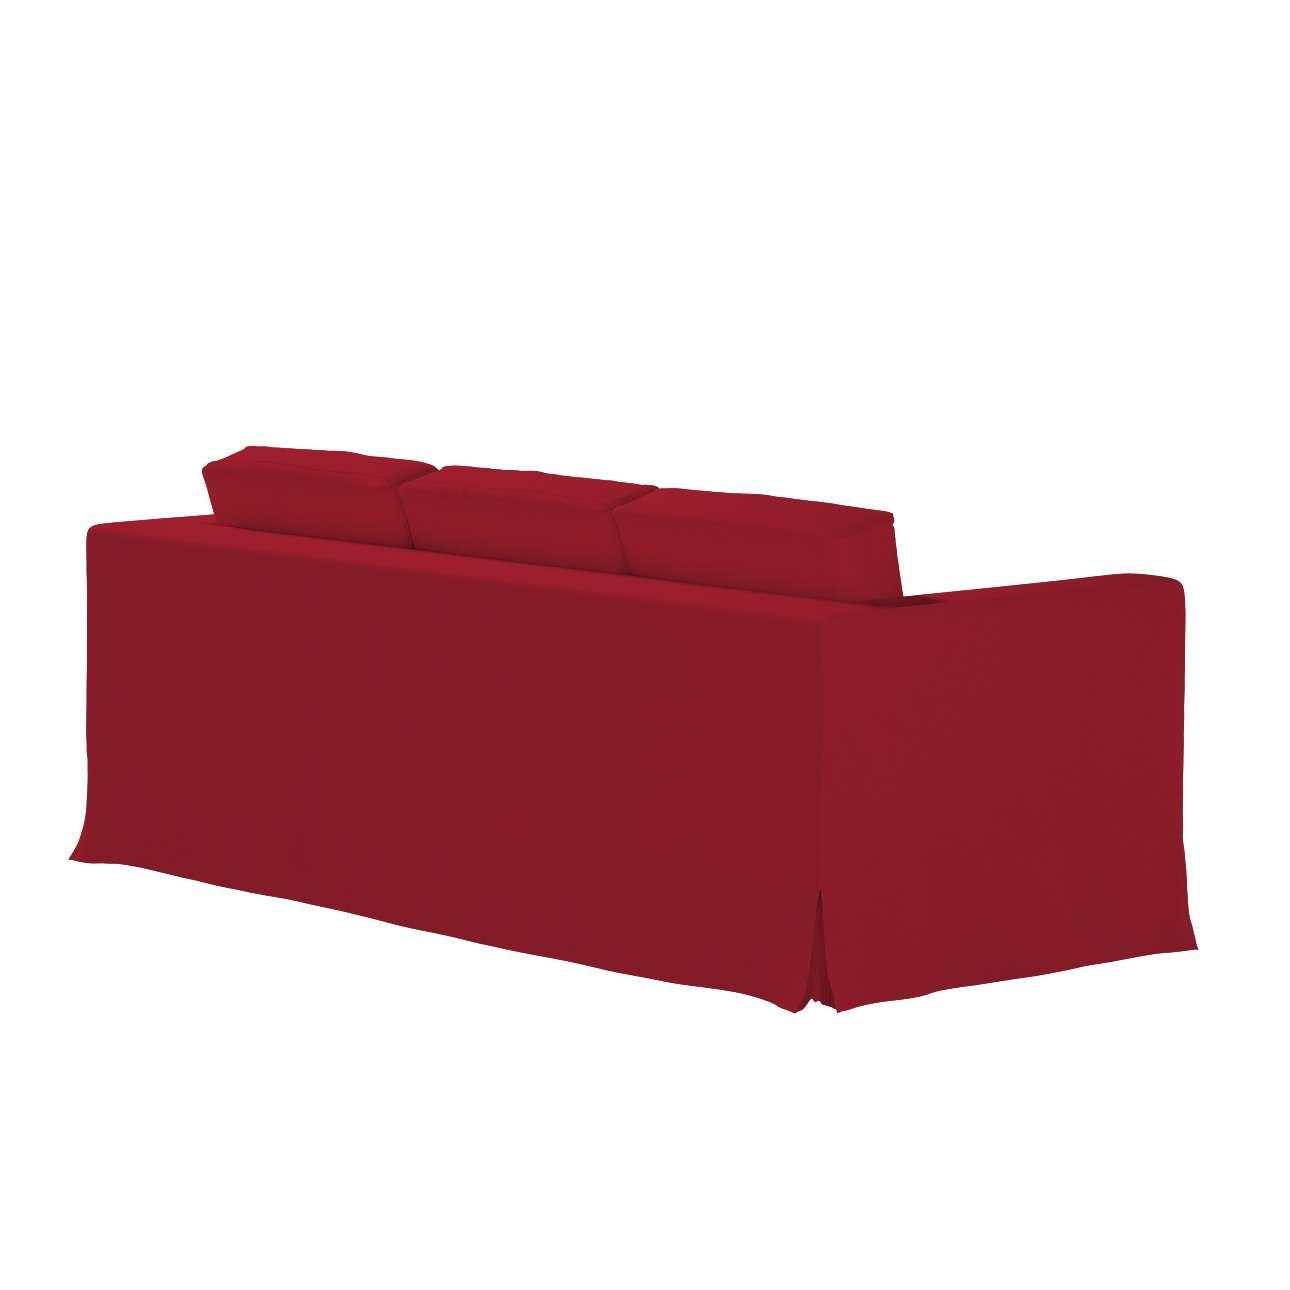 Karlanda 3-Sitzer Sofabezug nicht ausklappbar lang, rot